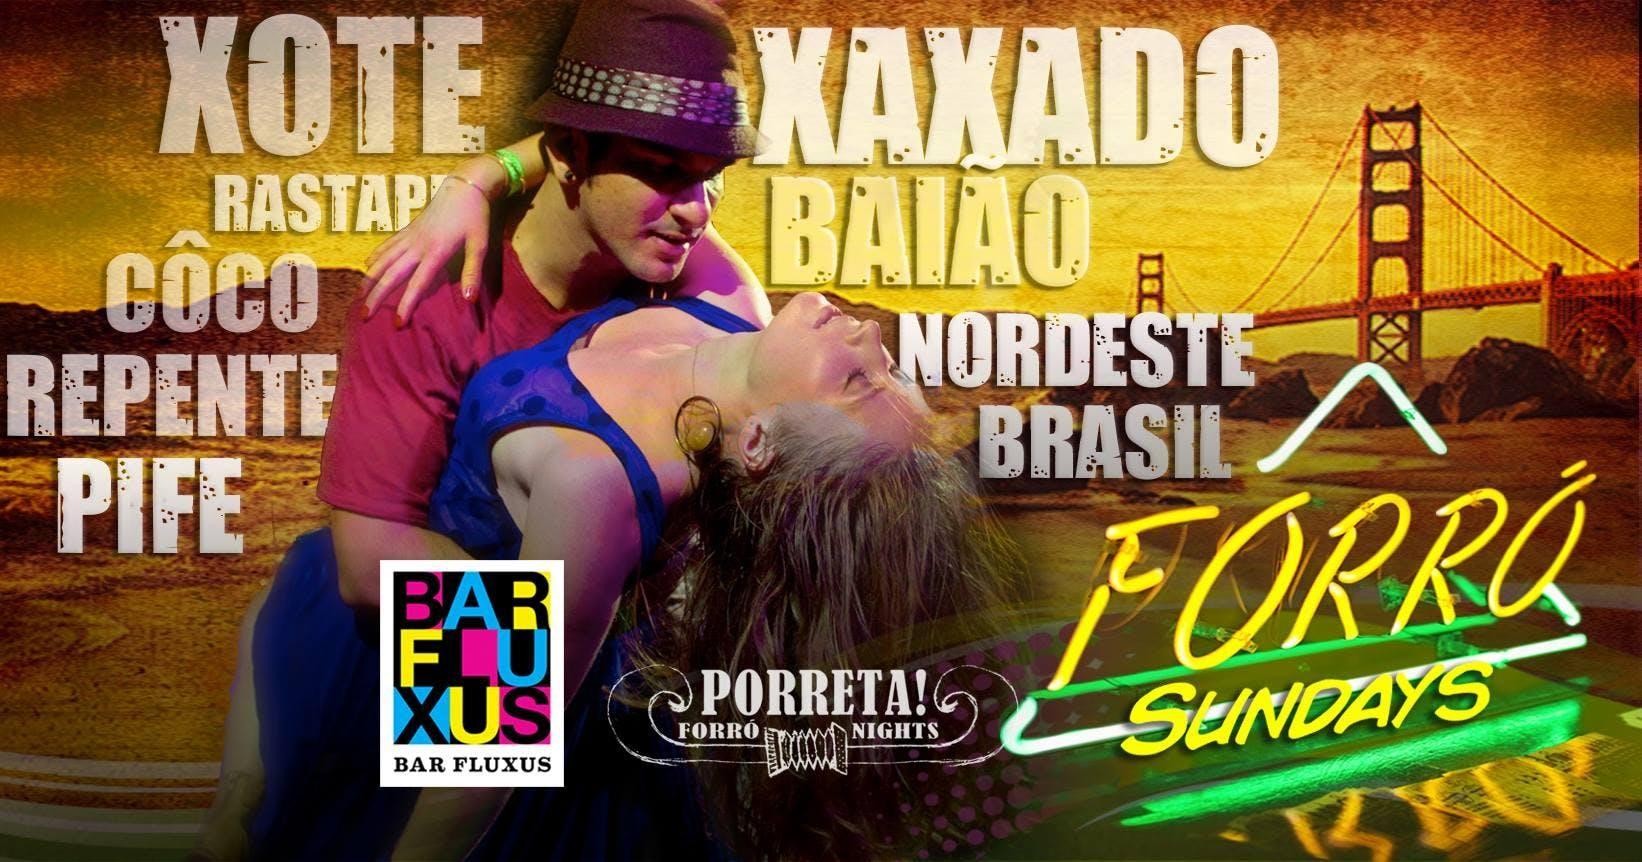 Brazilian Forró Sundays